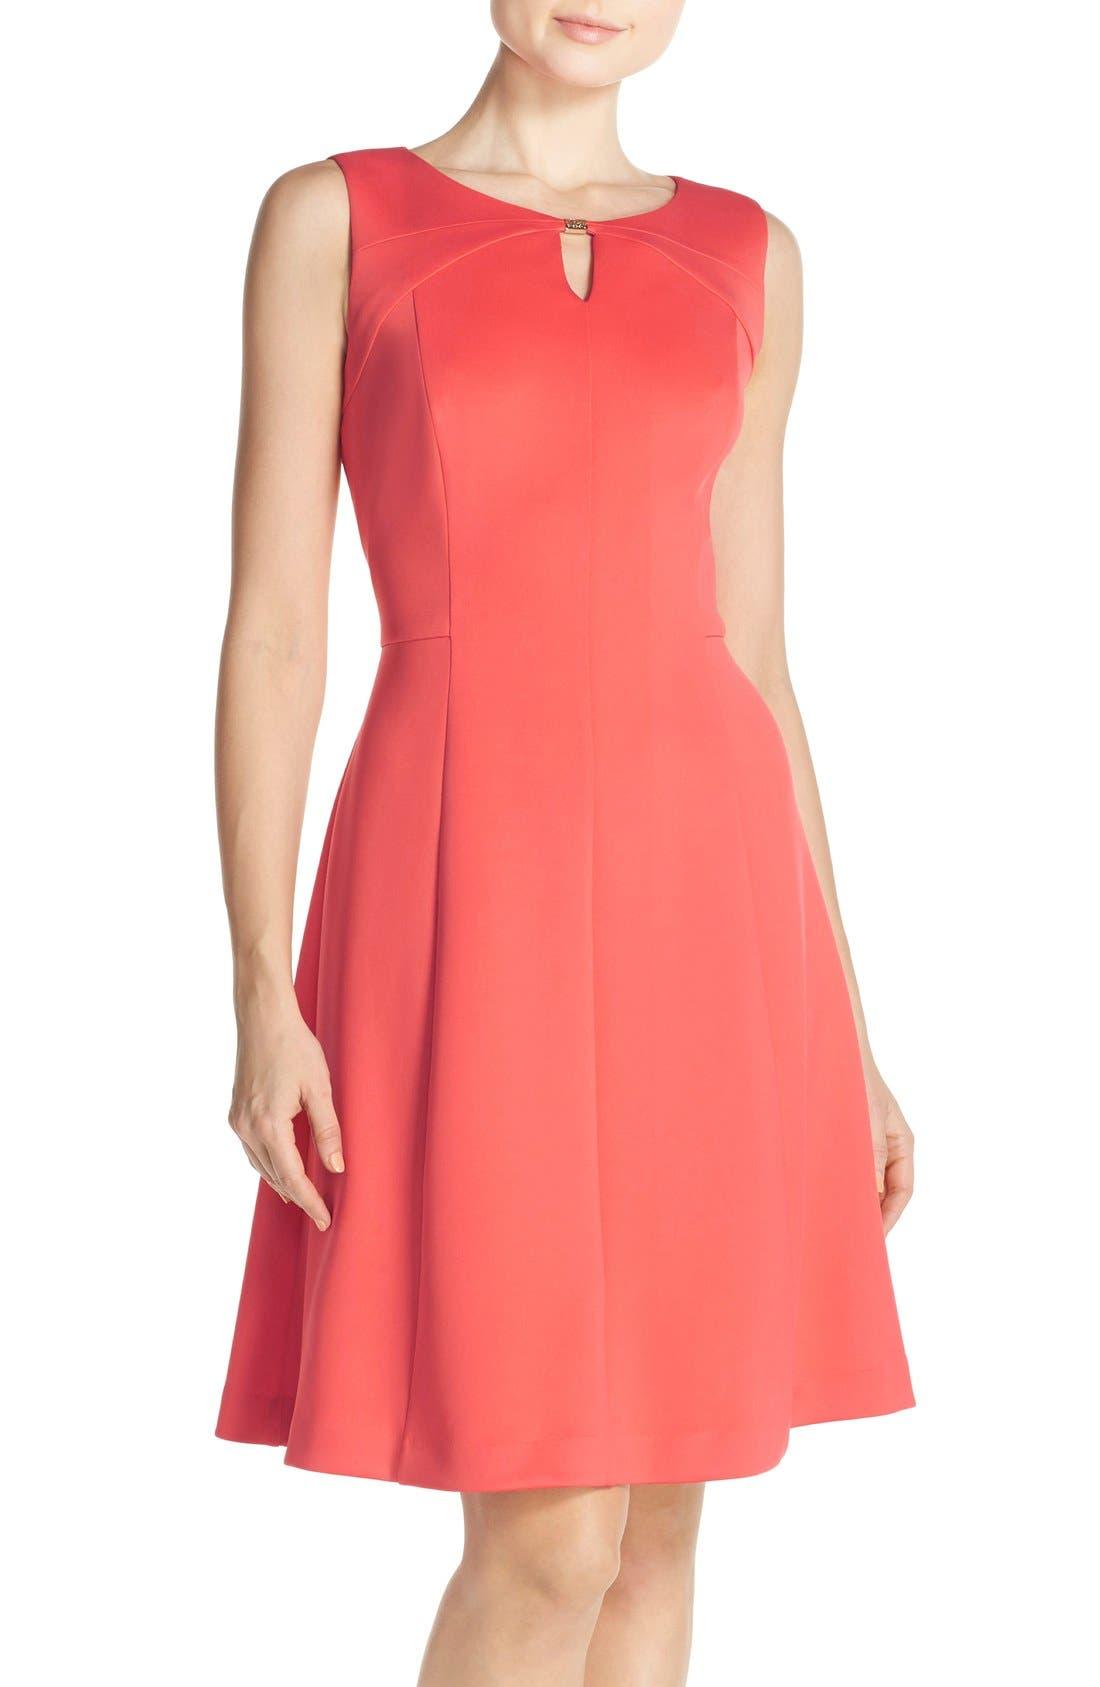 Alternate Image 1 Selected - Ellen Tracy Keyhole Front Scuba Fit & Flare Dress (Regular & Petite)